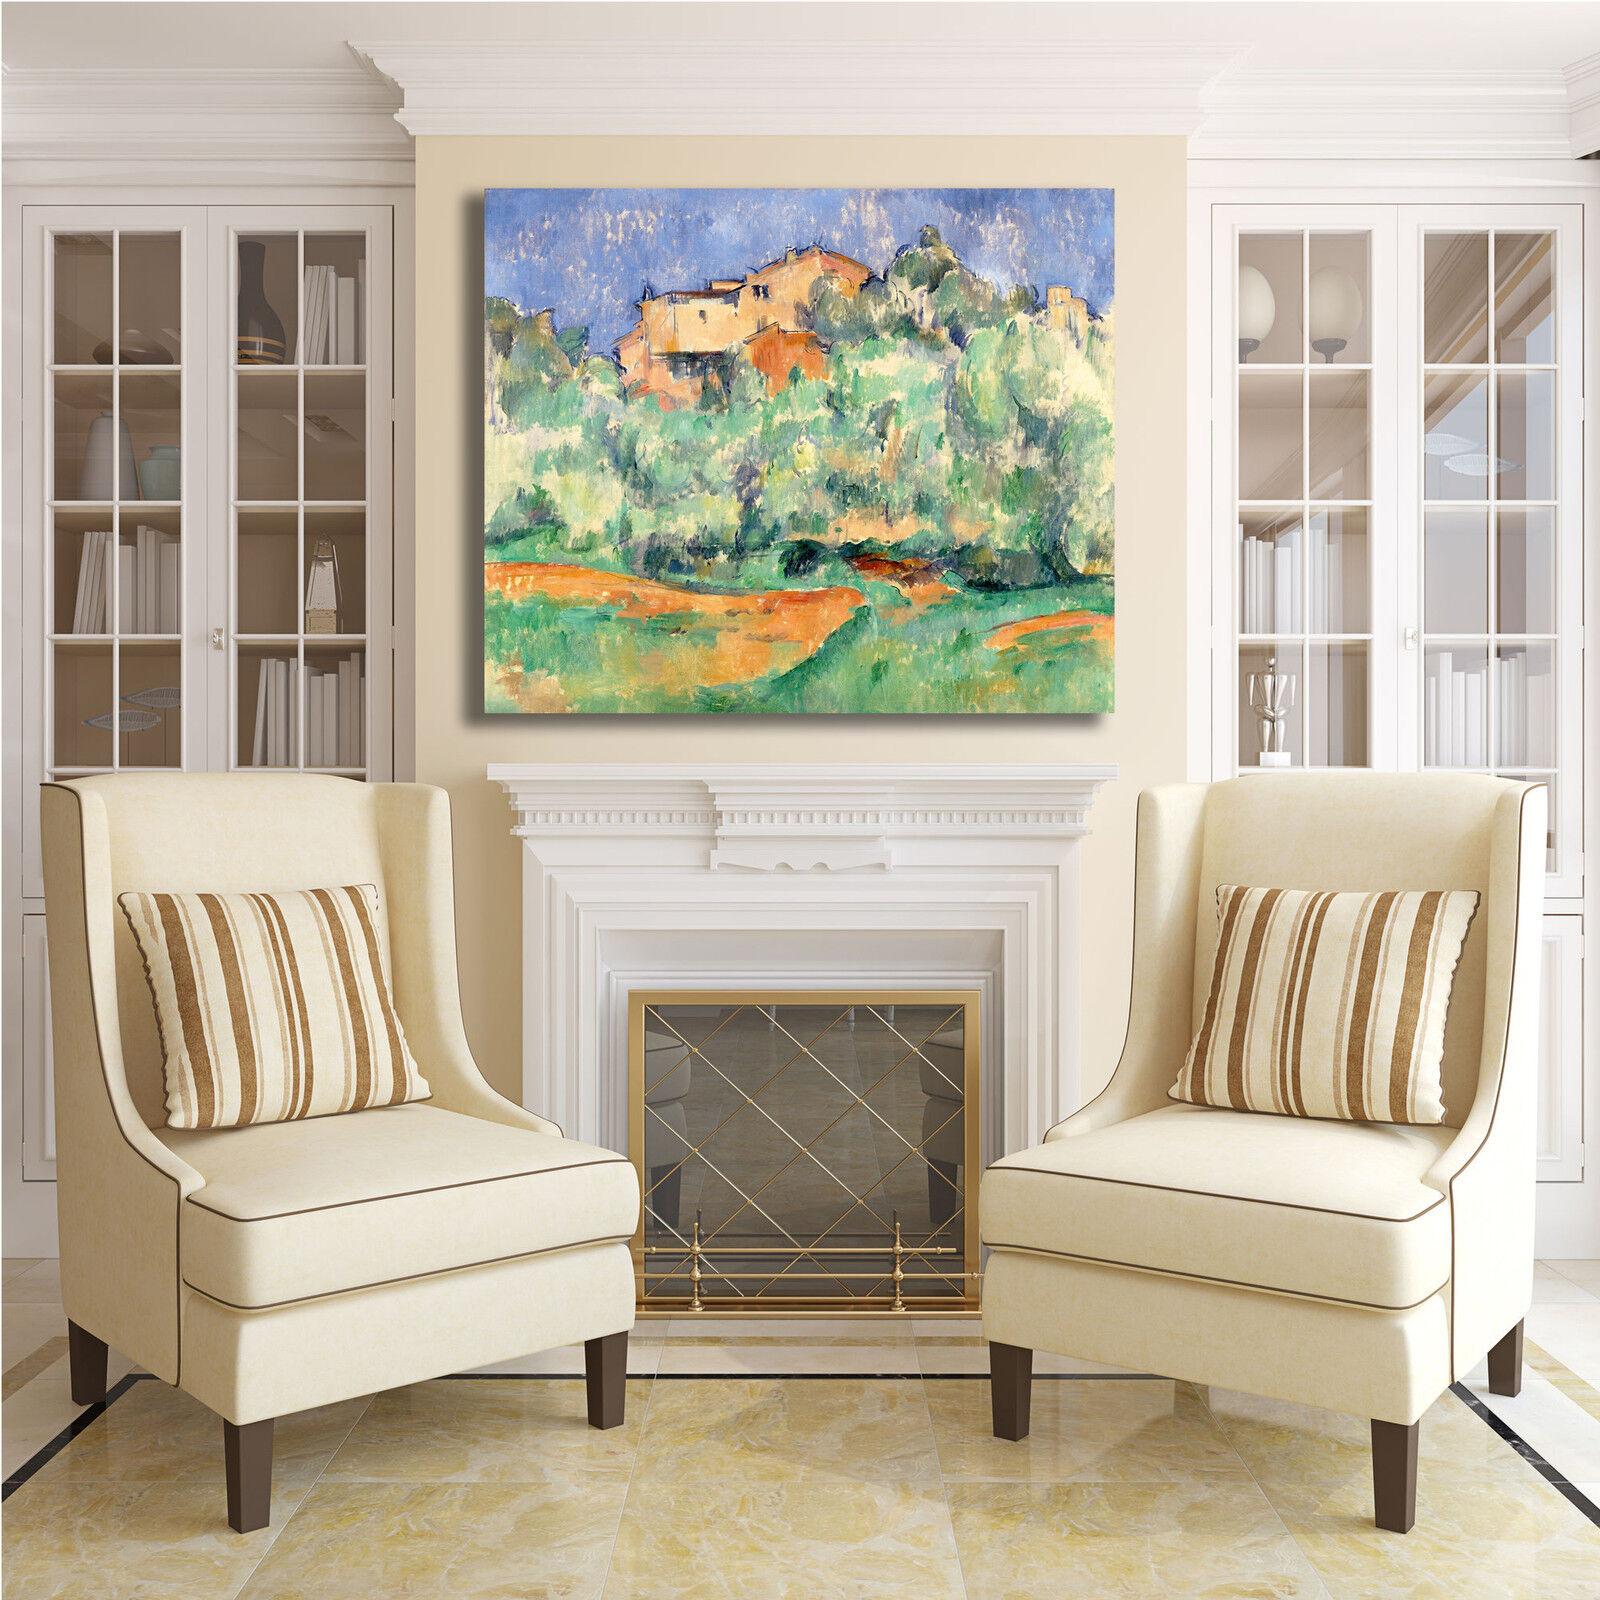 Cezanne fattoria bellevue design quadro stampa tela dipinto dipinto tela telaio arRouge o casa 337a6d